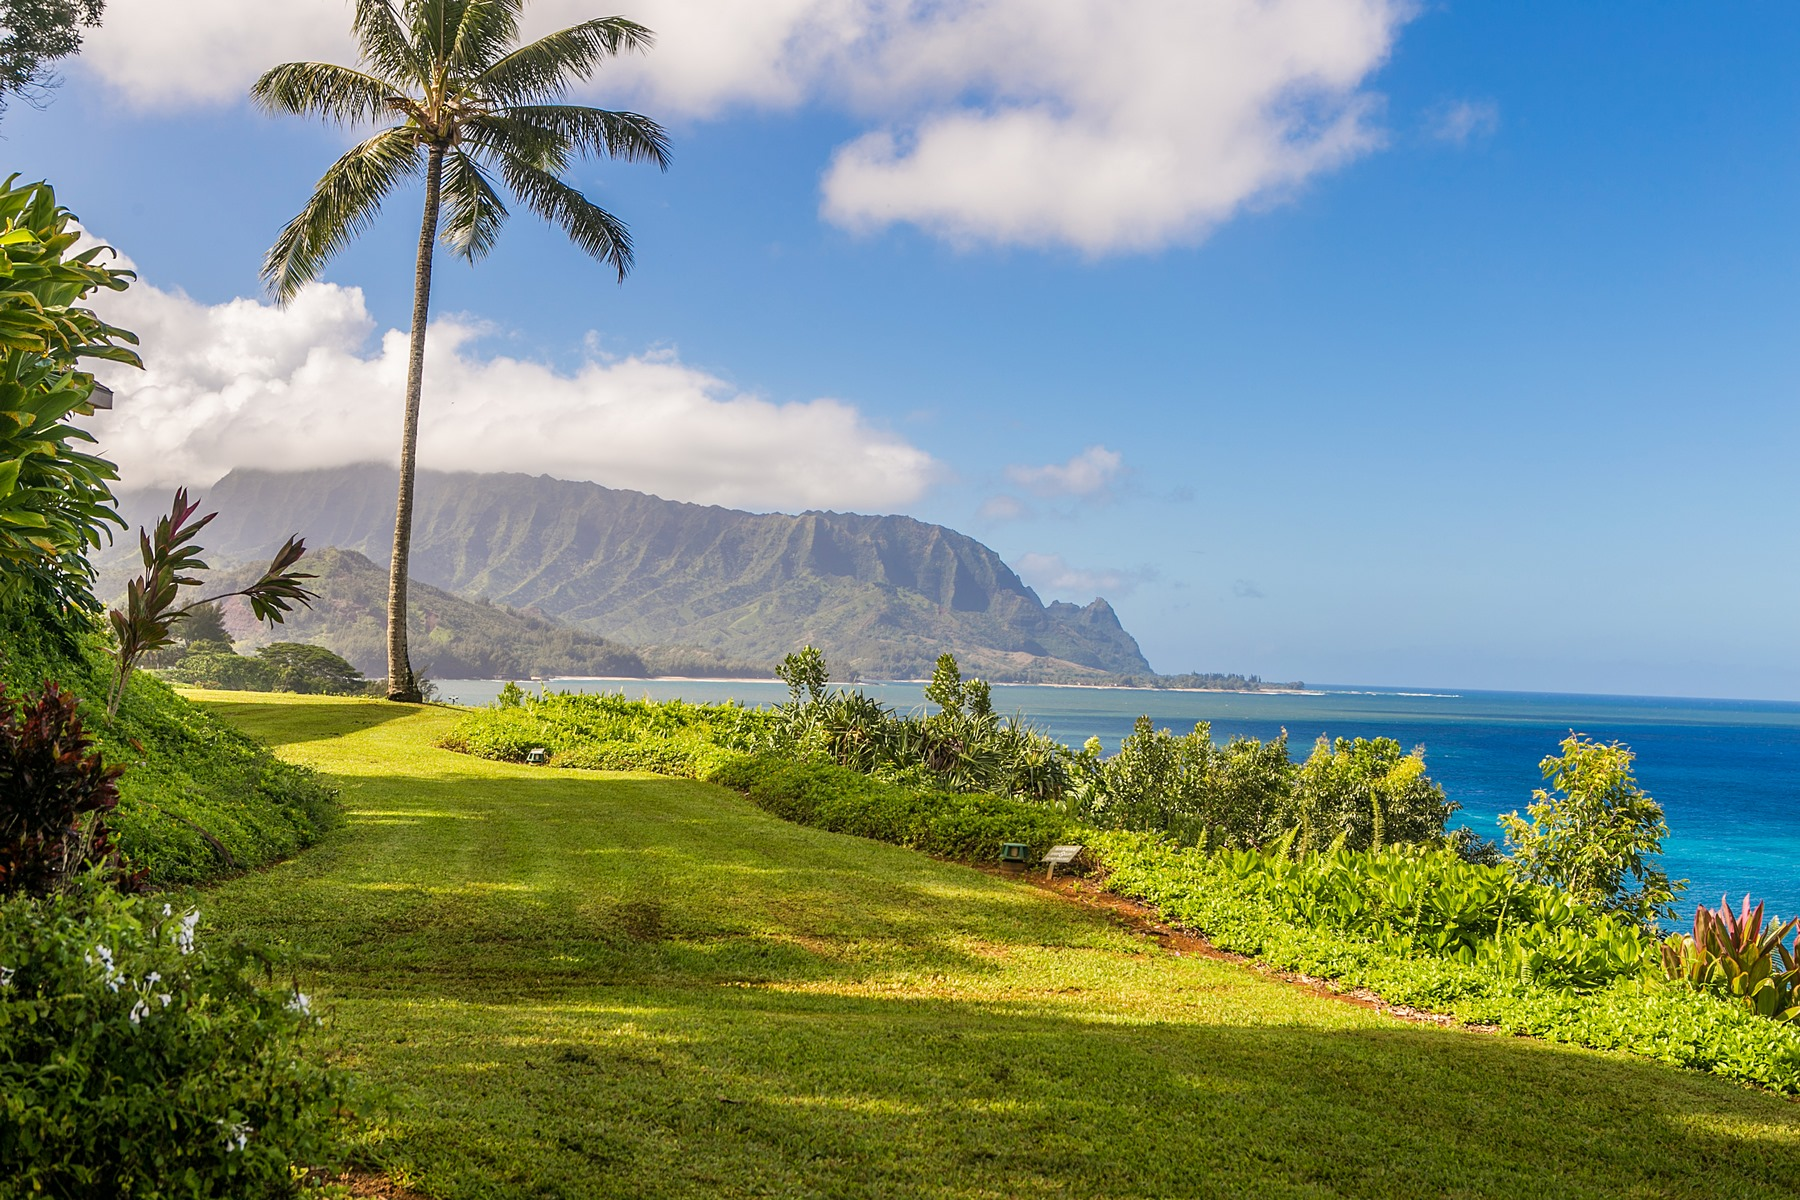 Condominiums 为 销售 在 5300 KA HAKU RD #119 PRINCEVILLE, HI 96722 5300 KA HAKU RD #119 普林斯维尔, 夏威夷 96722 美国